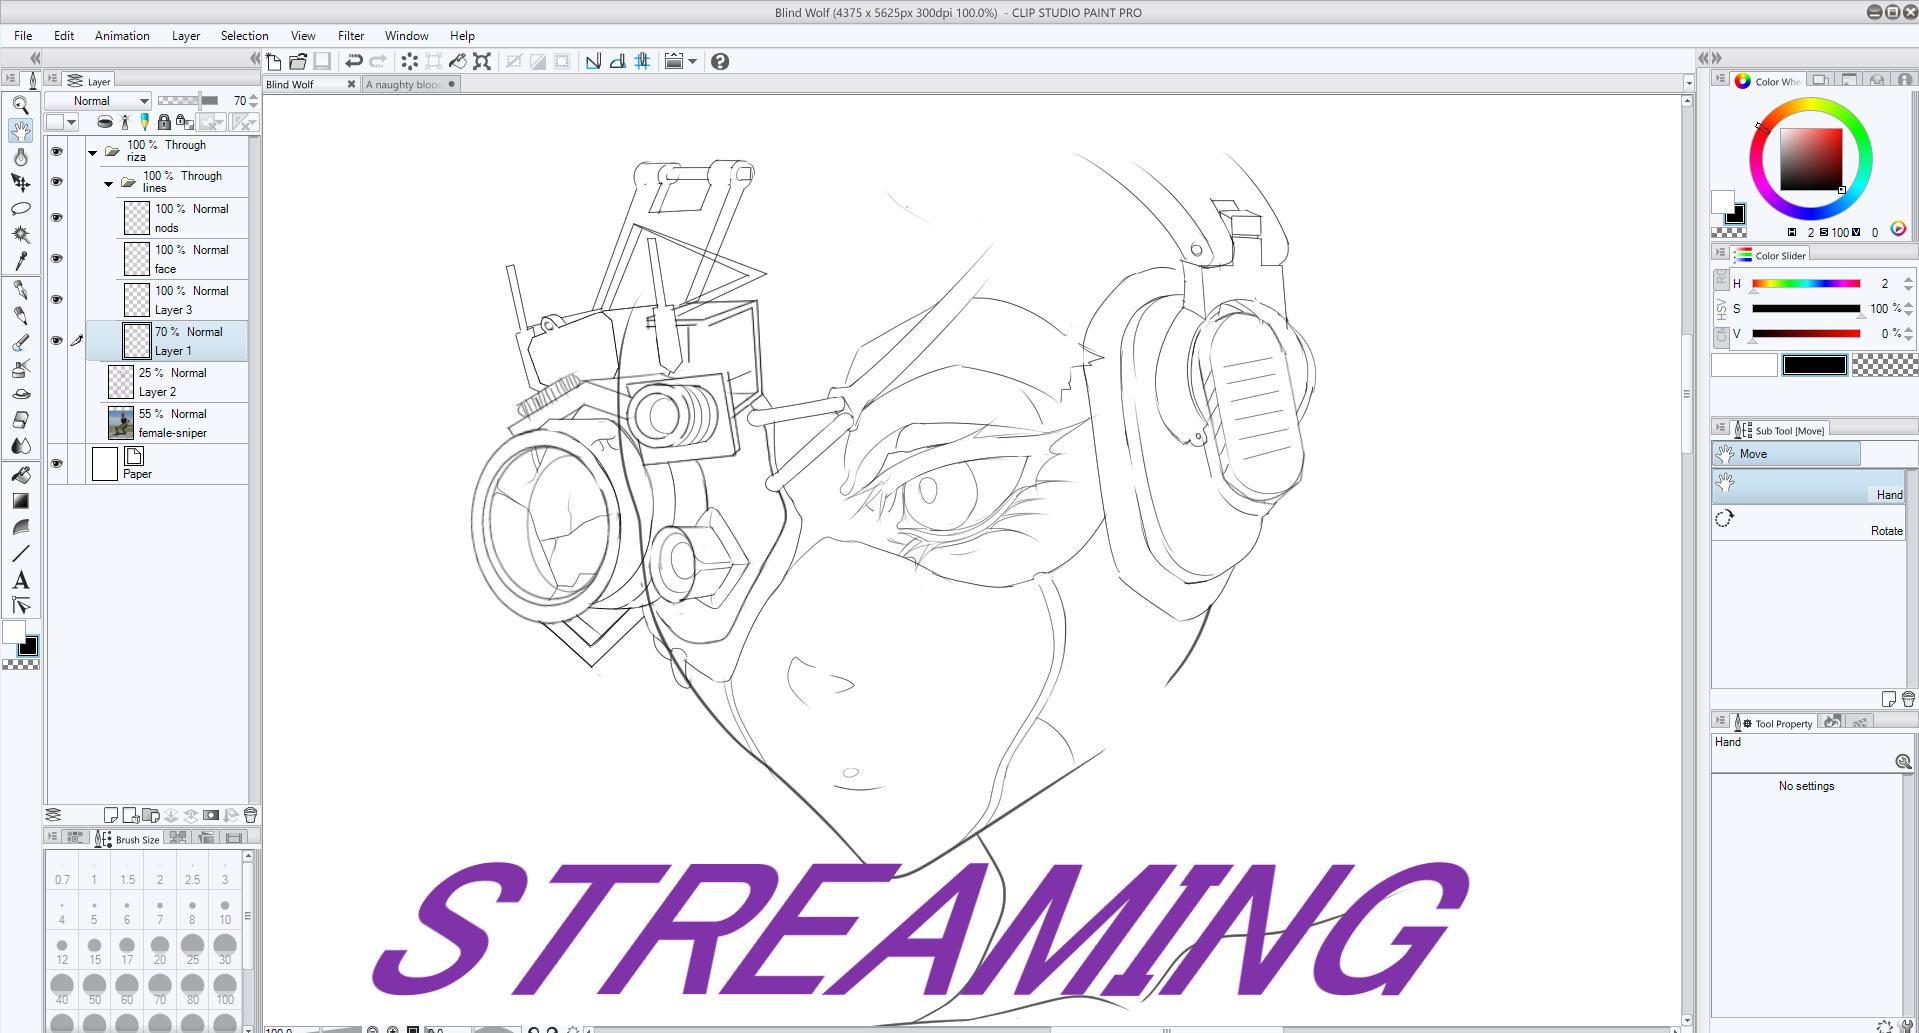 10/26 stream